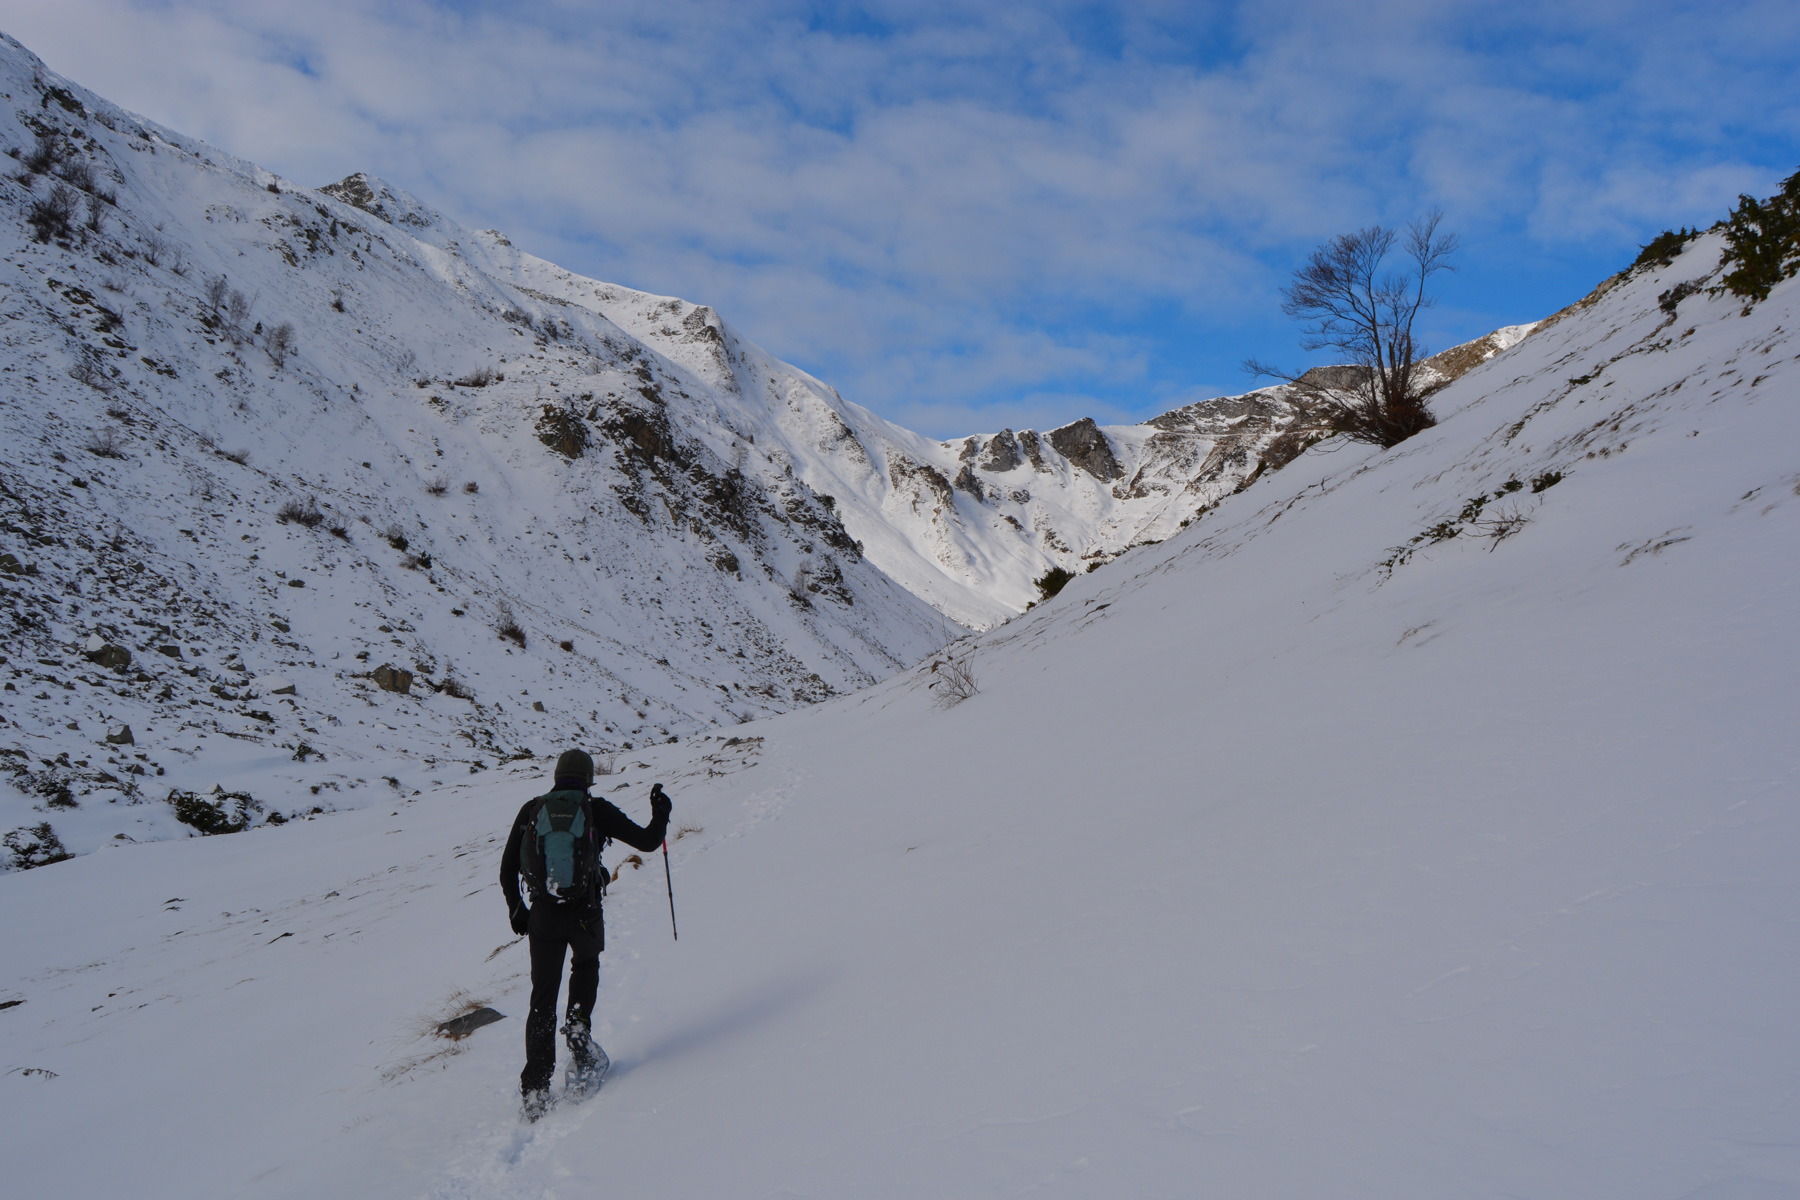 Ariège sous la neige, enfin ! 5